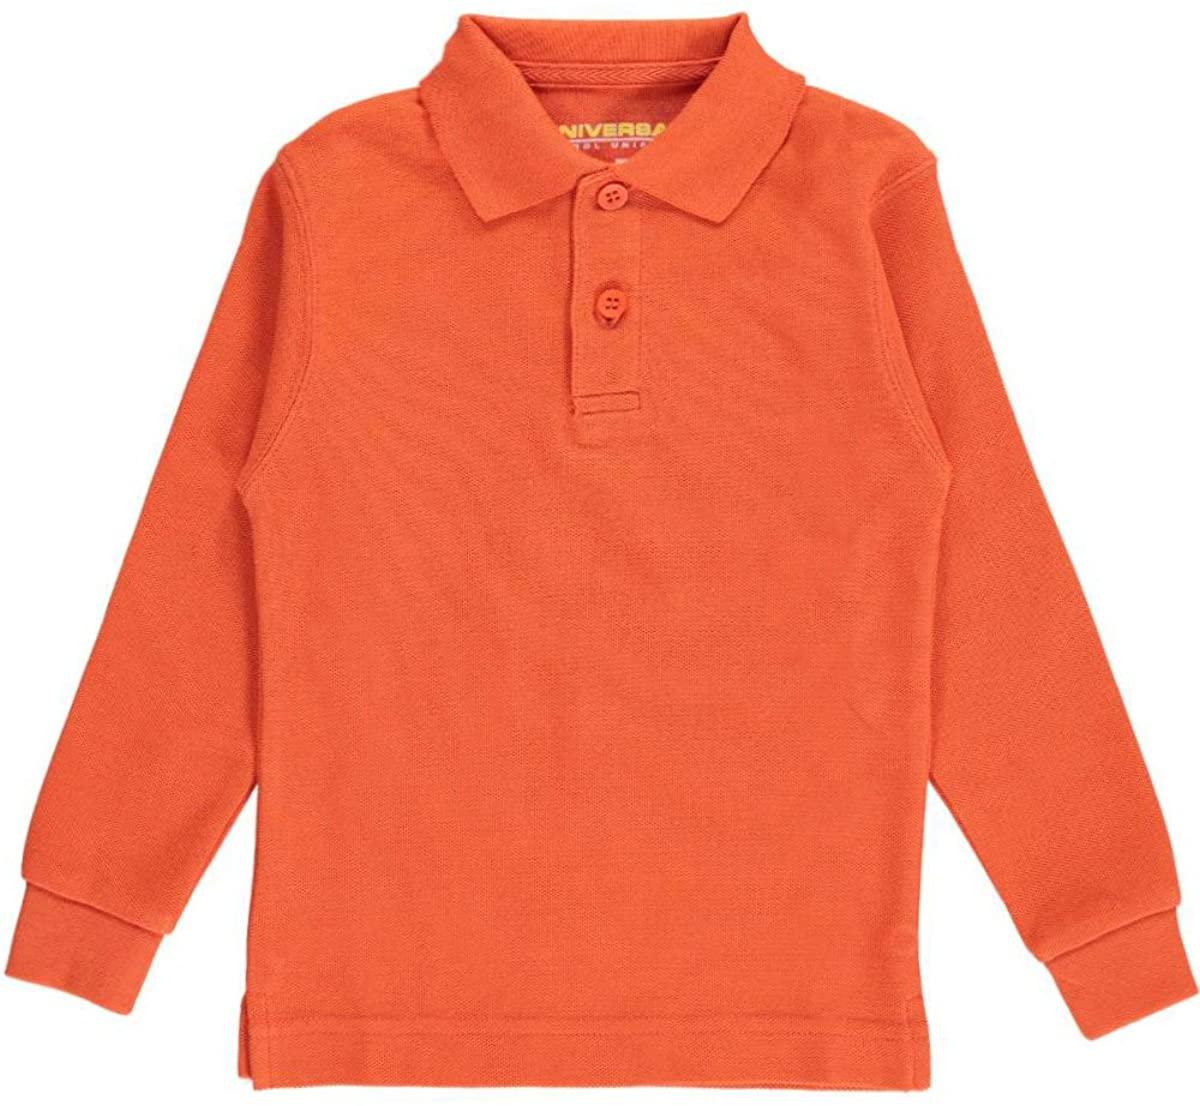 Universal Unisex L/S Pique Polo - Orange, 2t